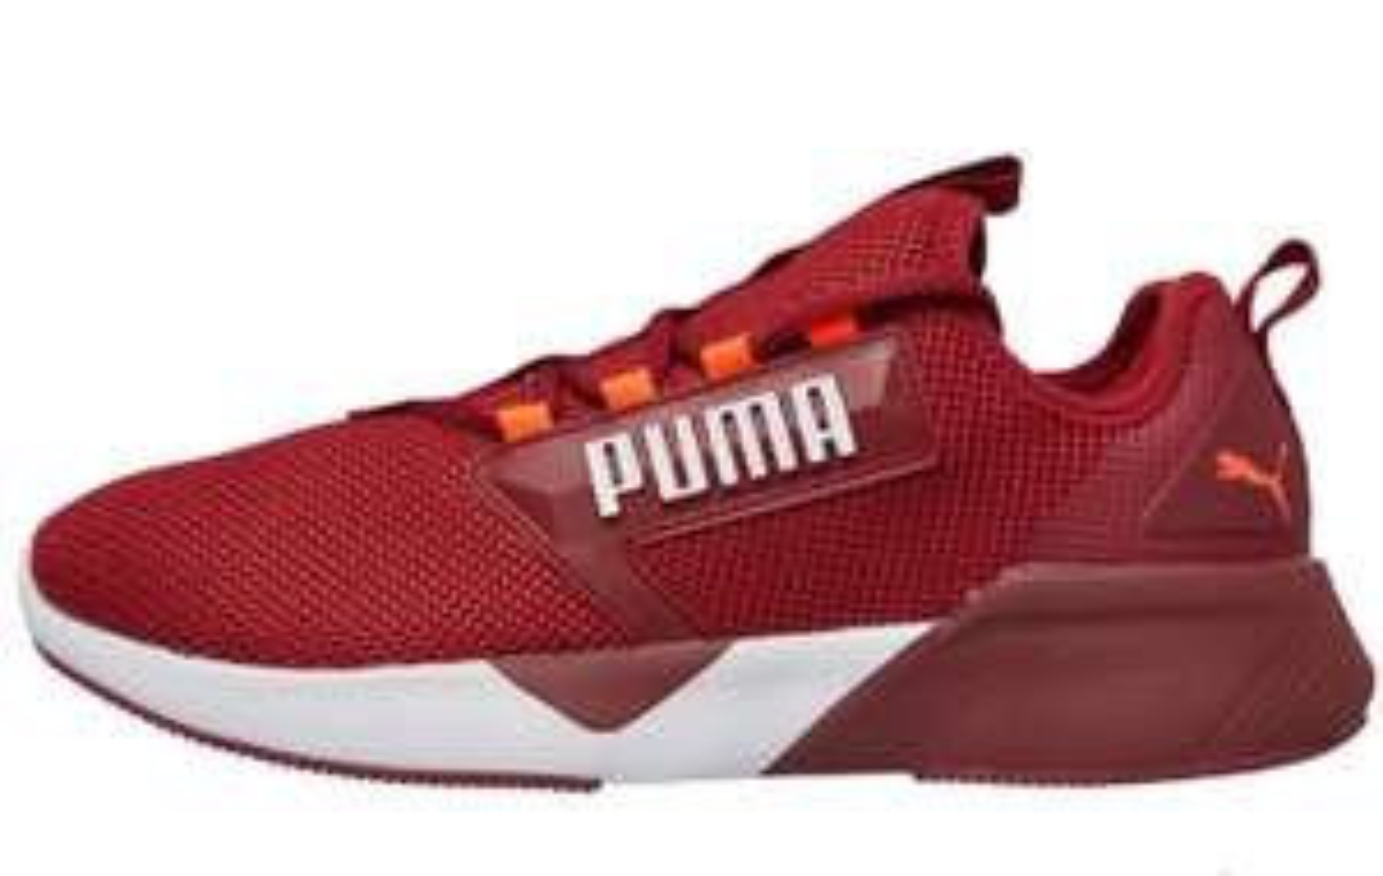 Puma Mens Retaliate Training Shoes Rhubarb £24.99 + £4.99 delivery at MandM Direct